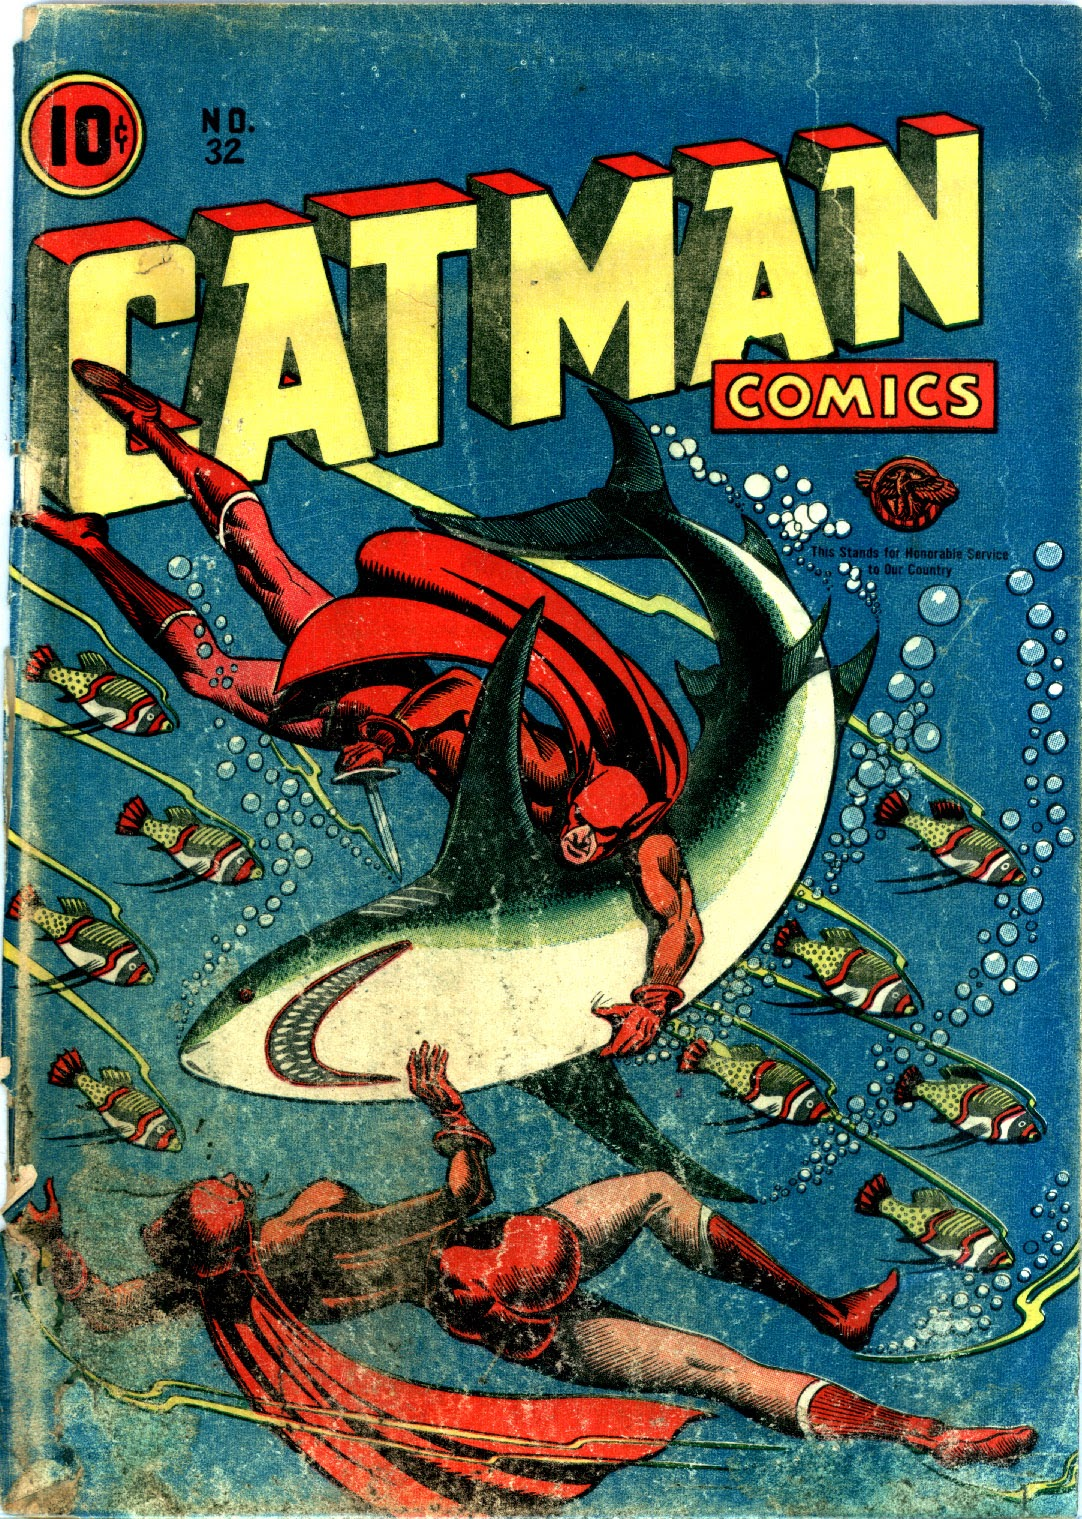 Cat-Man Comics 32 Page 1